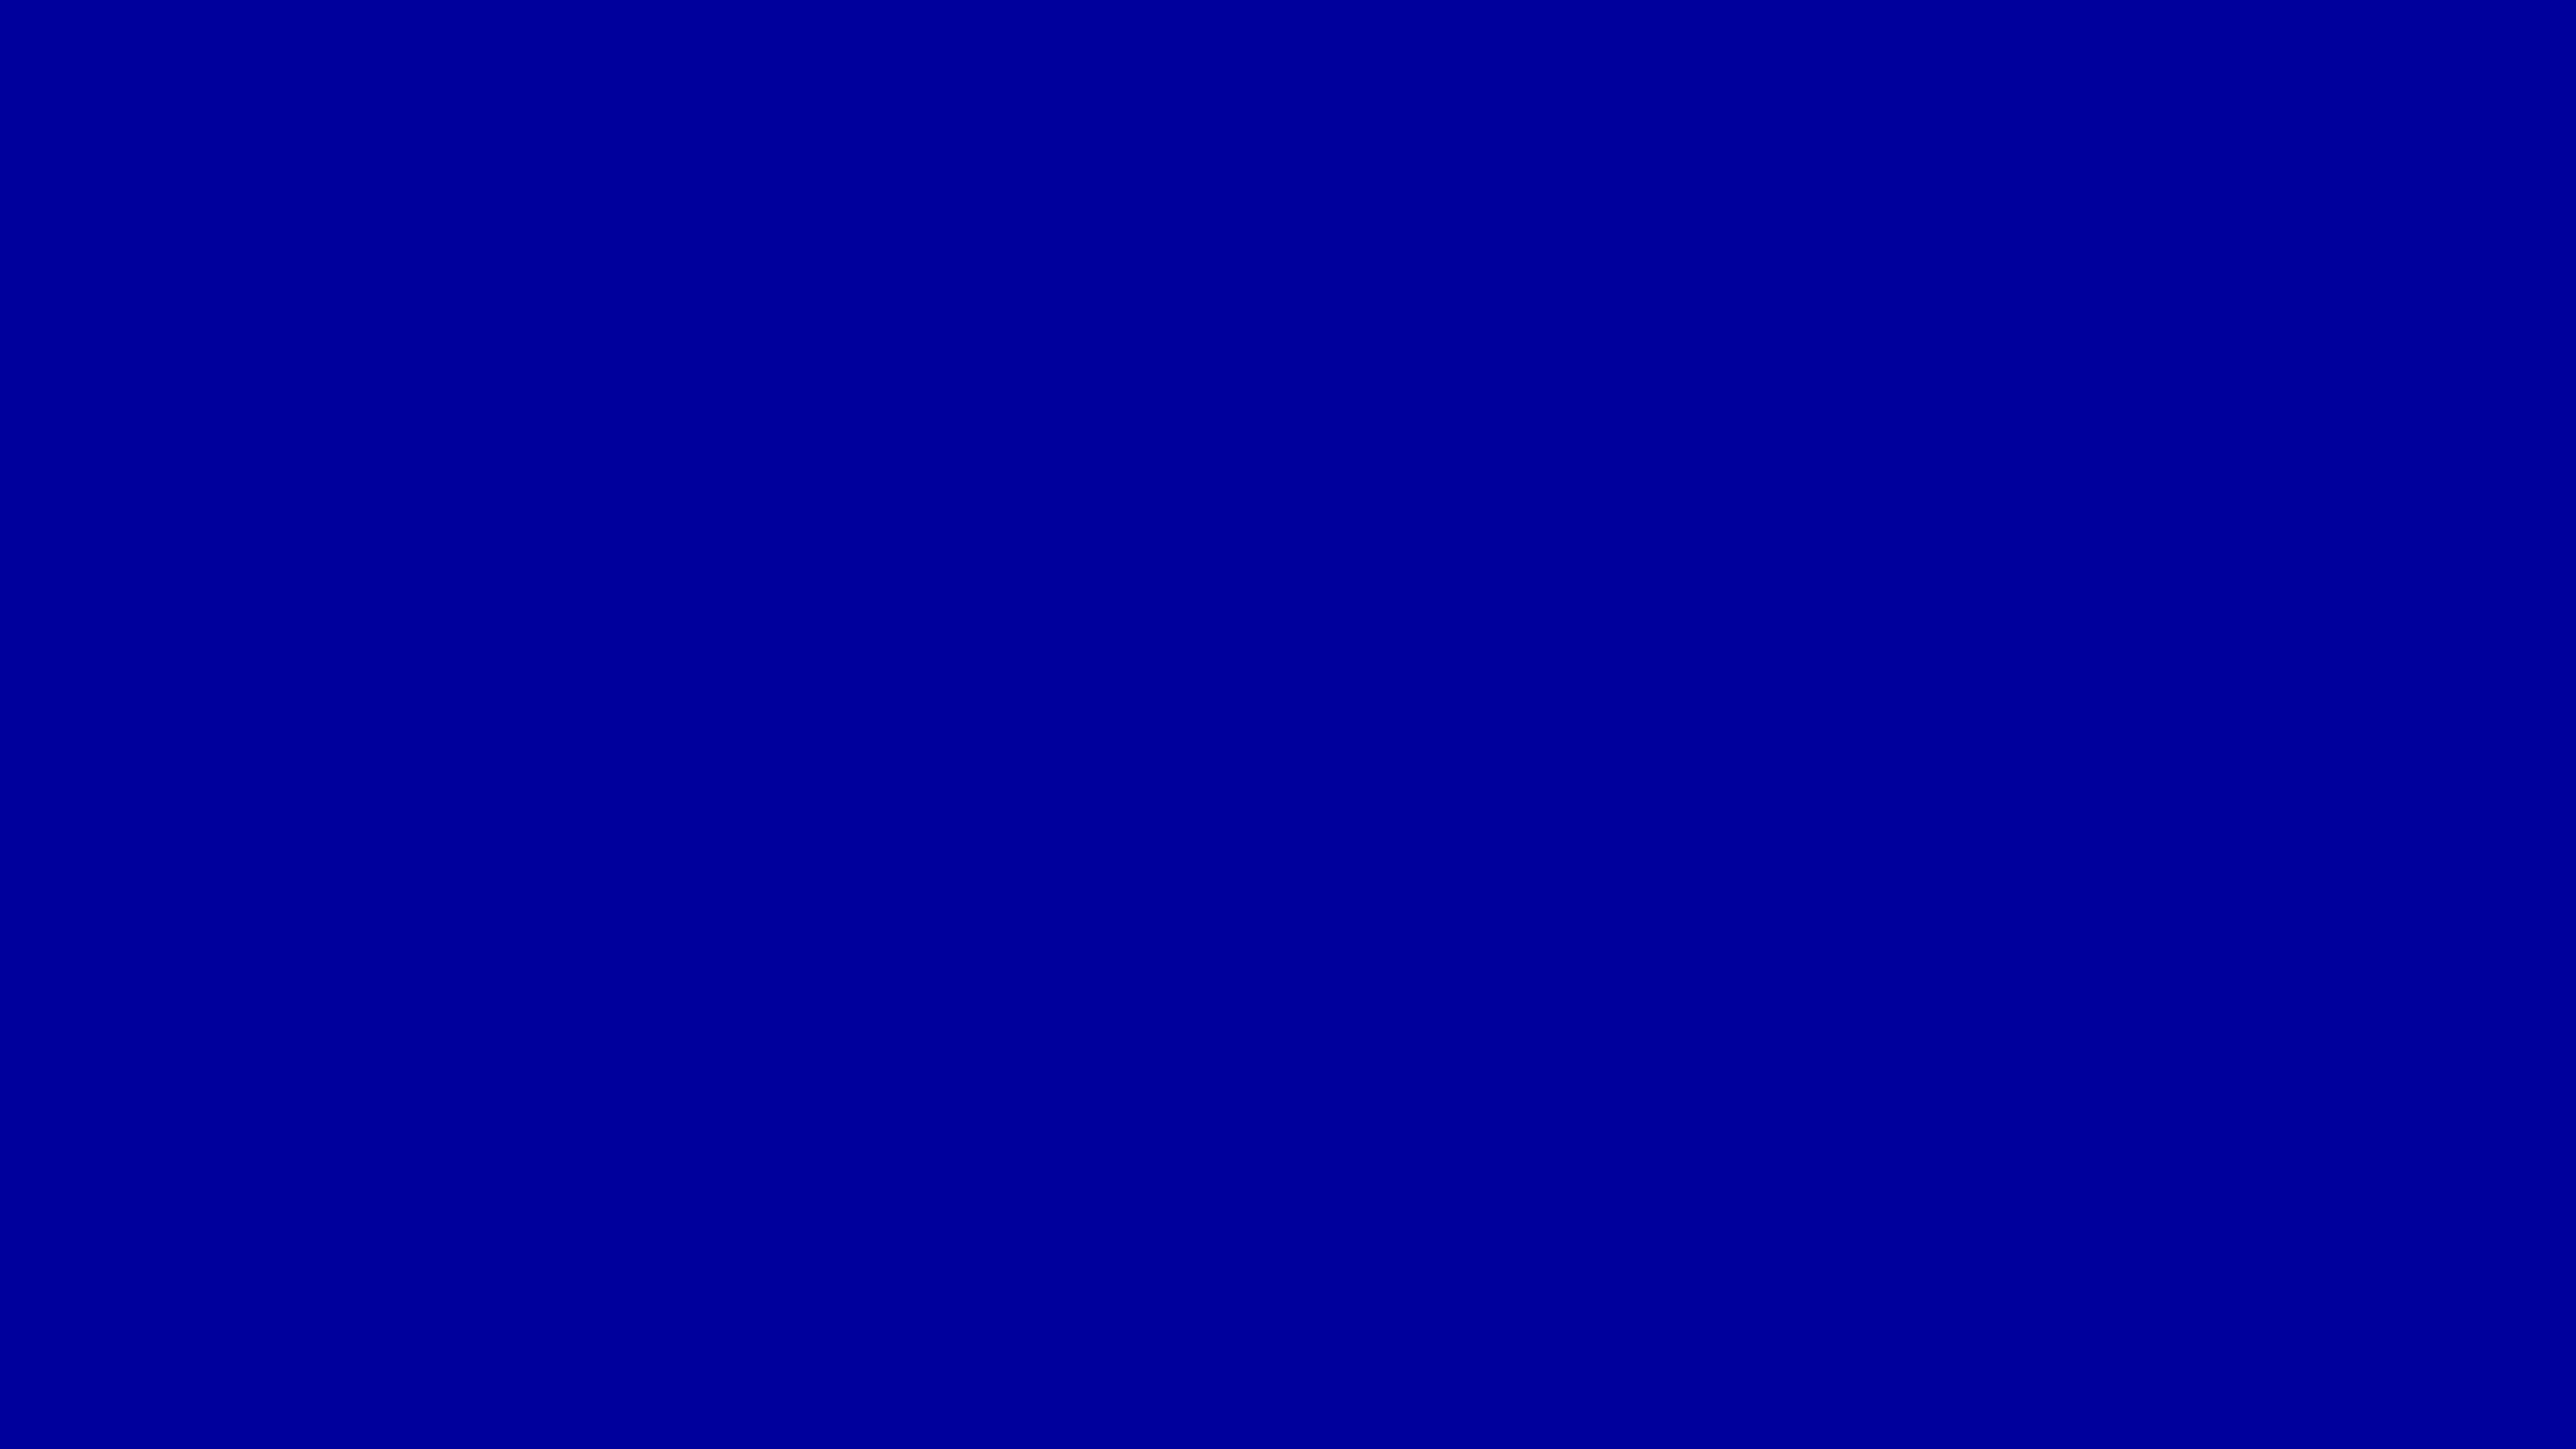 3840x2160 Duke Blue Solid Color Background